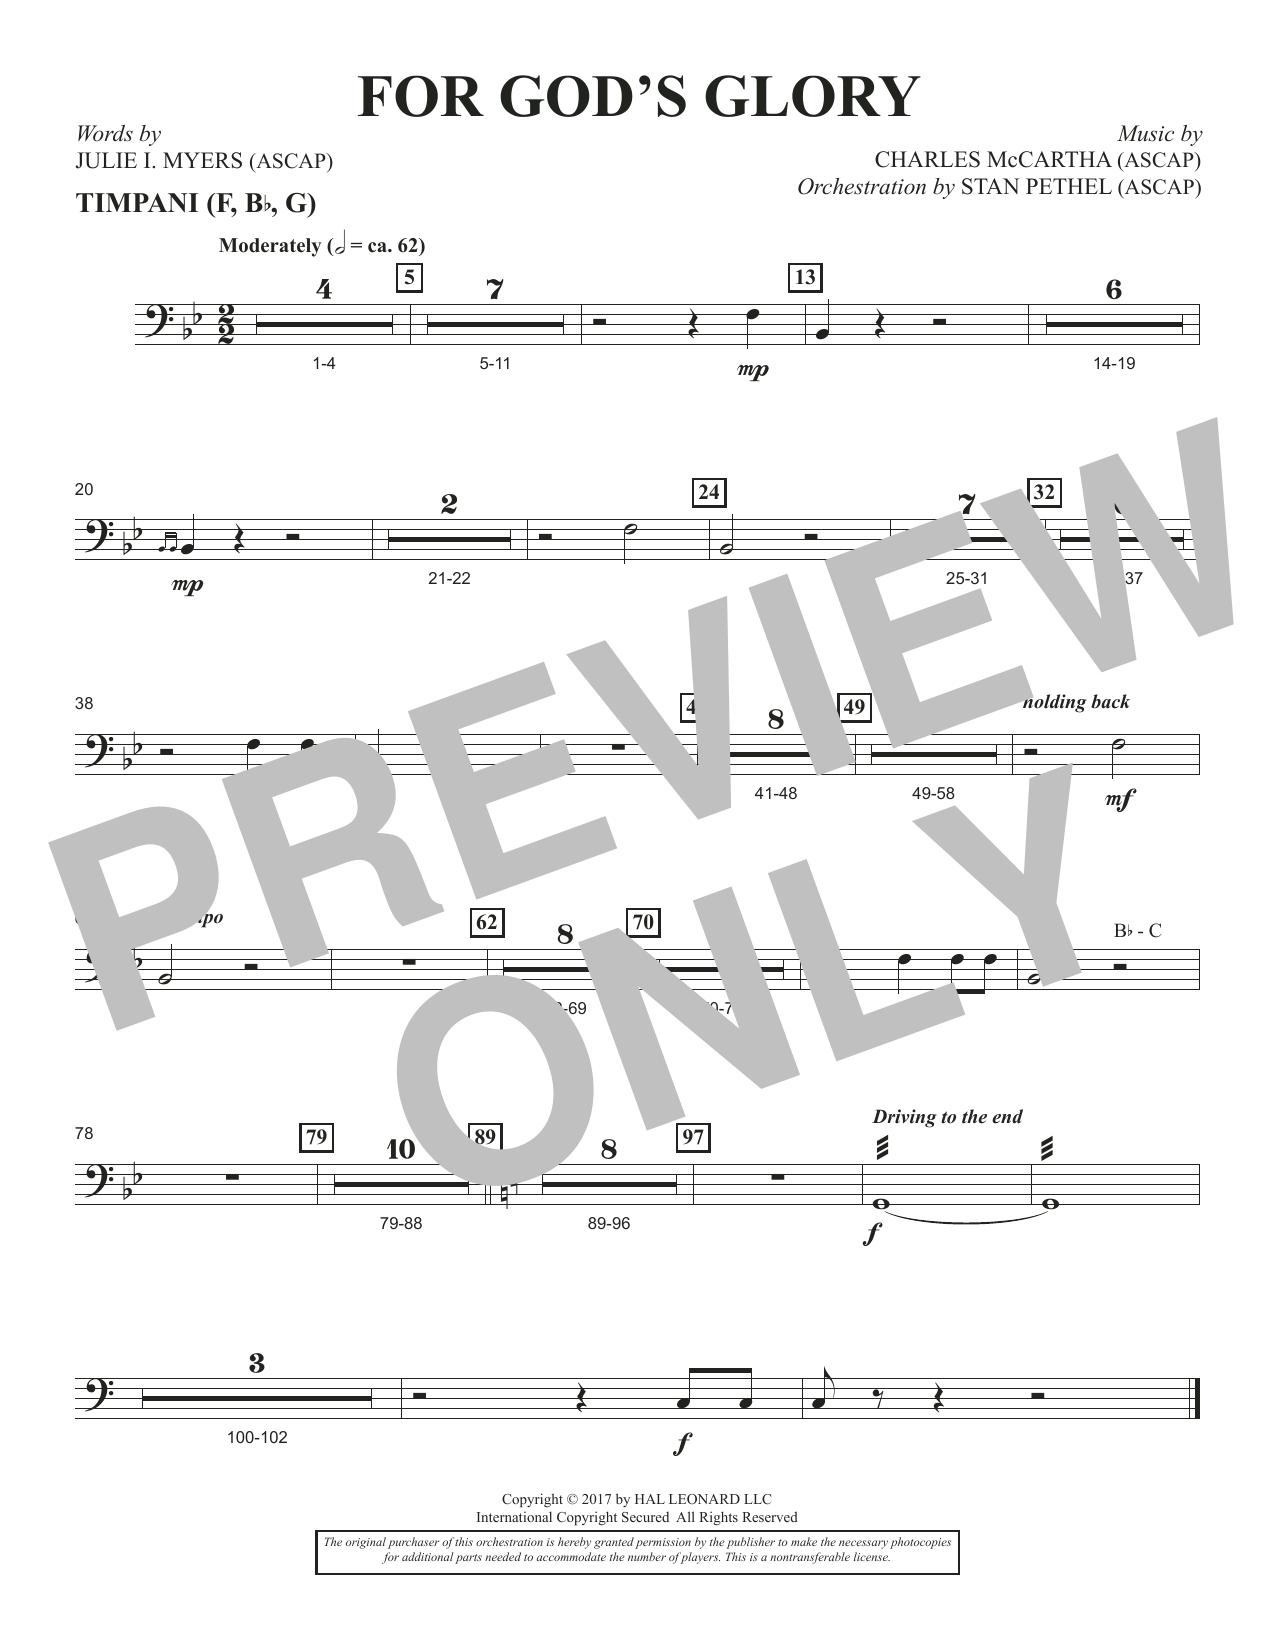 Charles McCartha For God's Glory - Timpani sheet music notes and chords. Download Printable PDF.